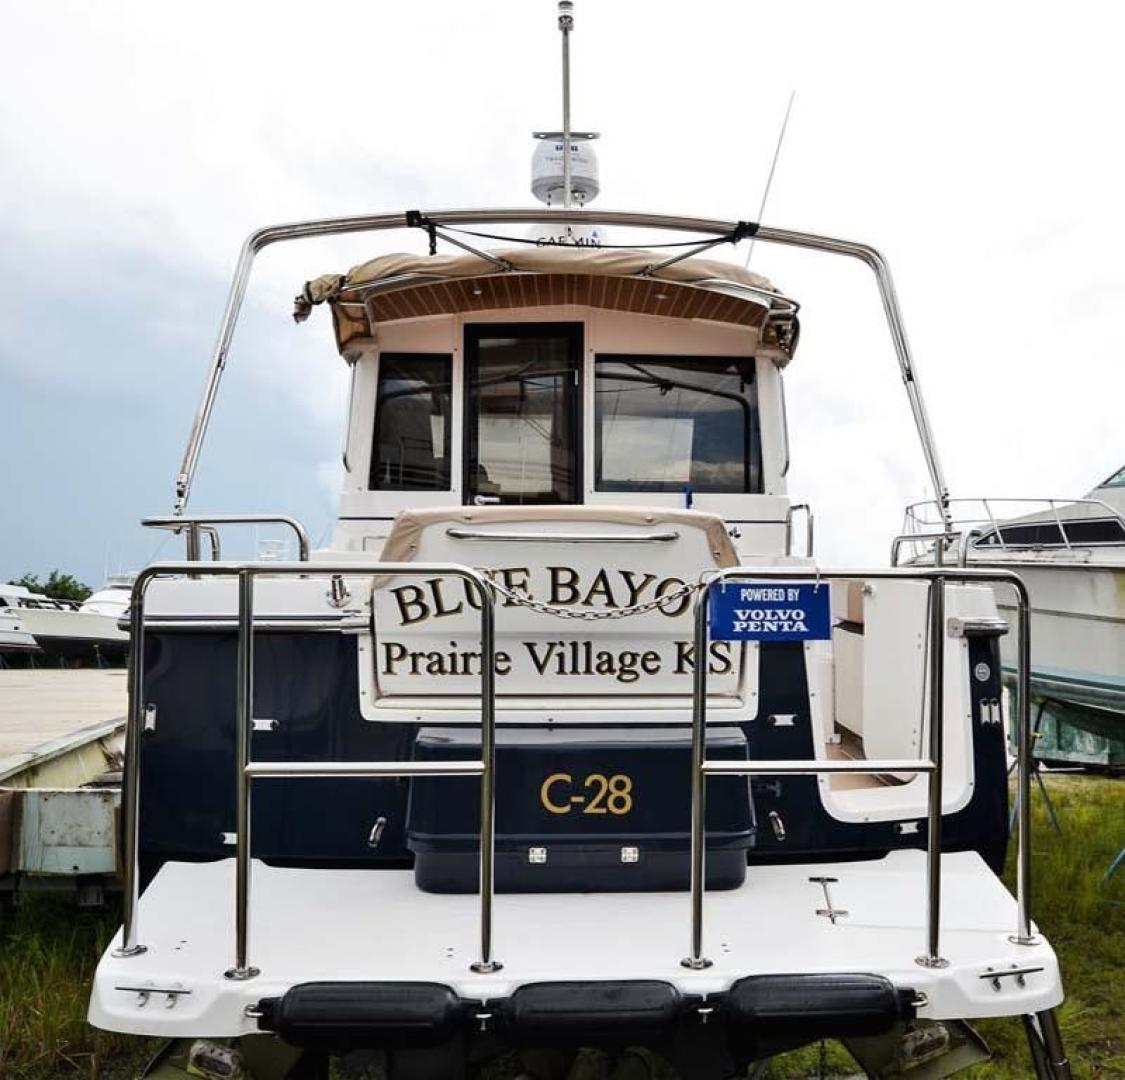 Cutwater-C-28-2018-Blue-Bayou-Stuart-Florida-United-States-Stern-976908